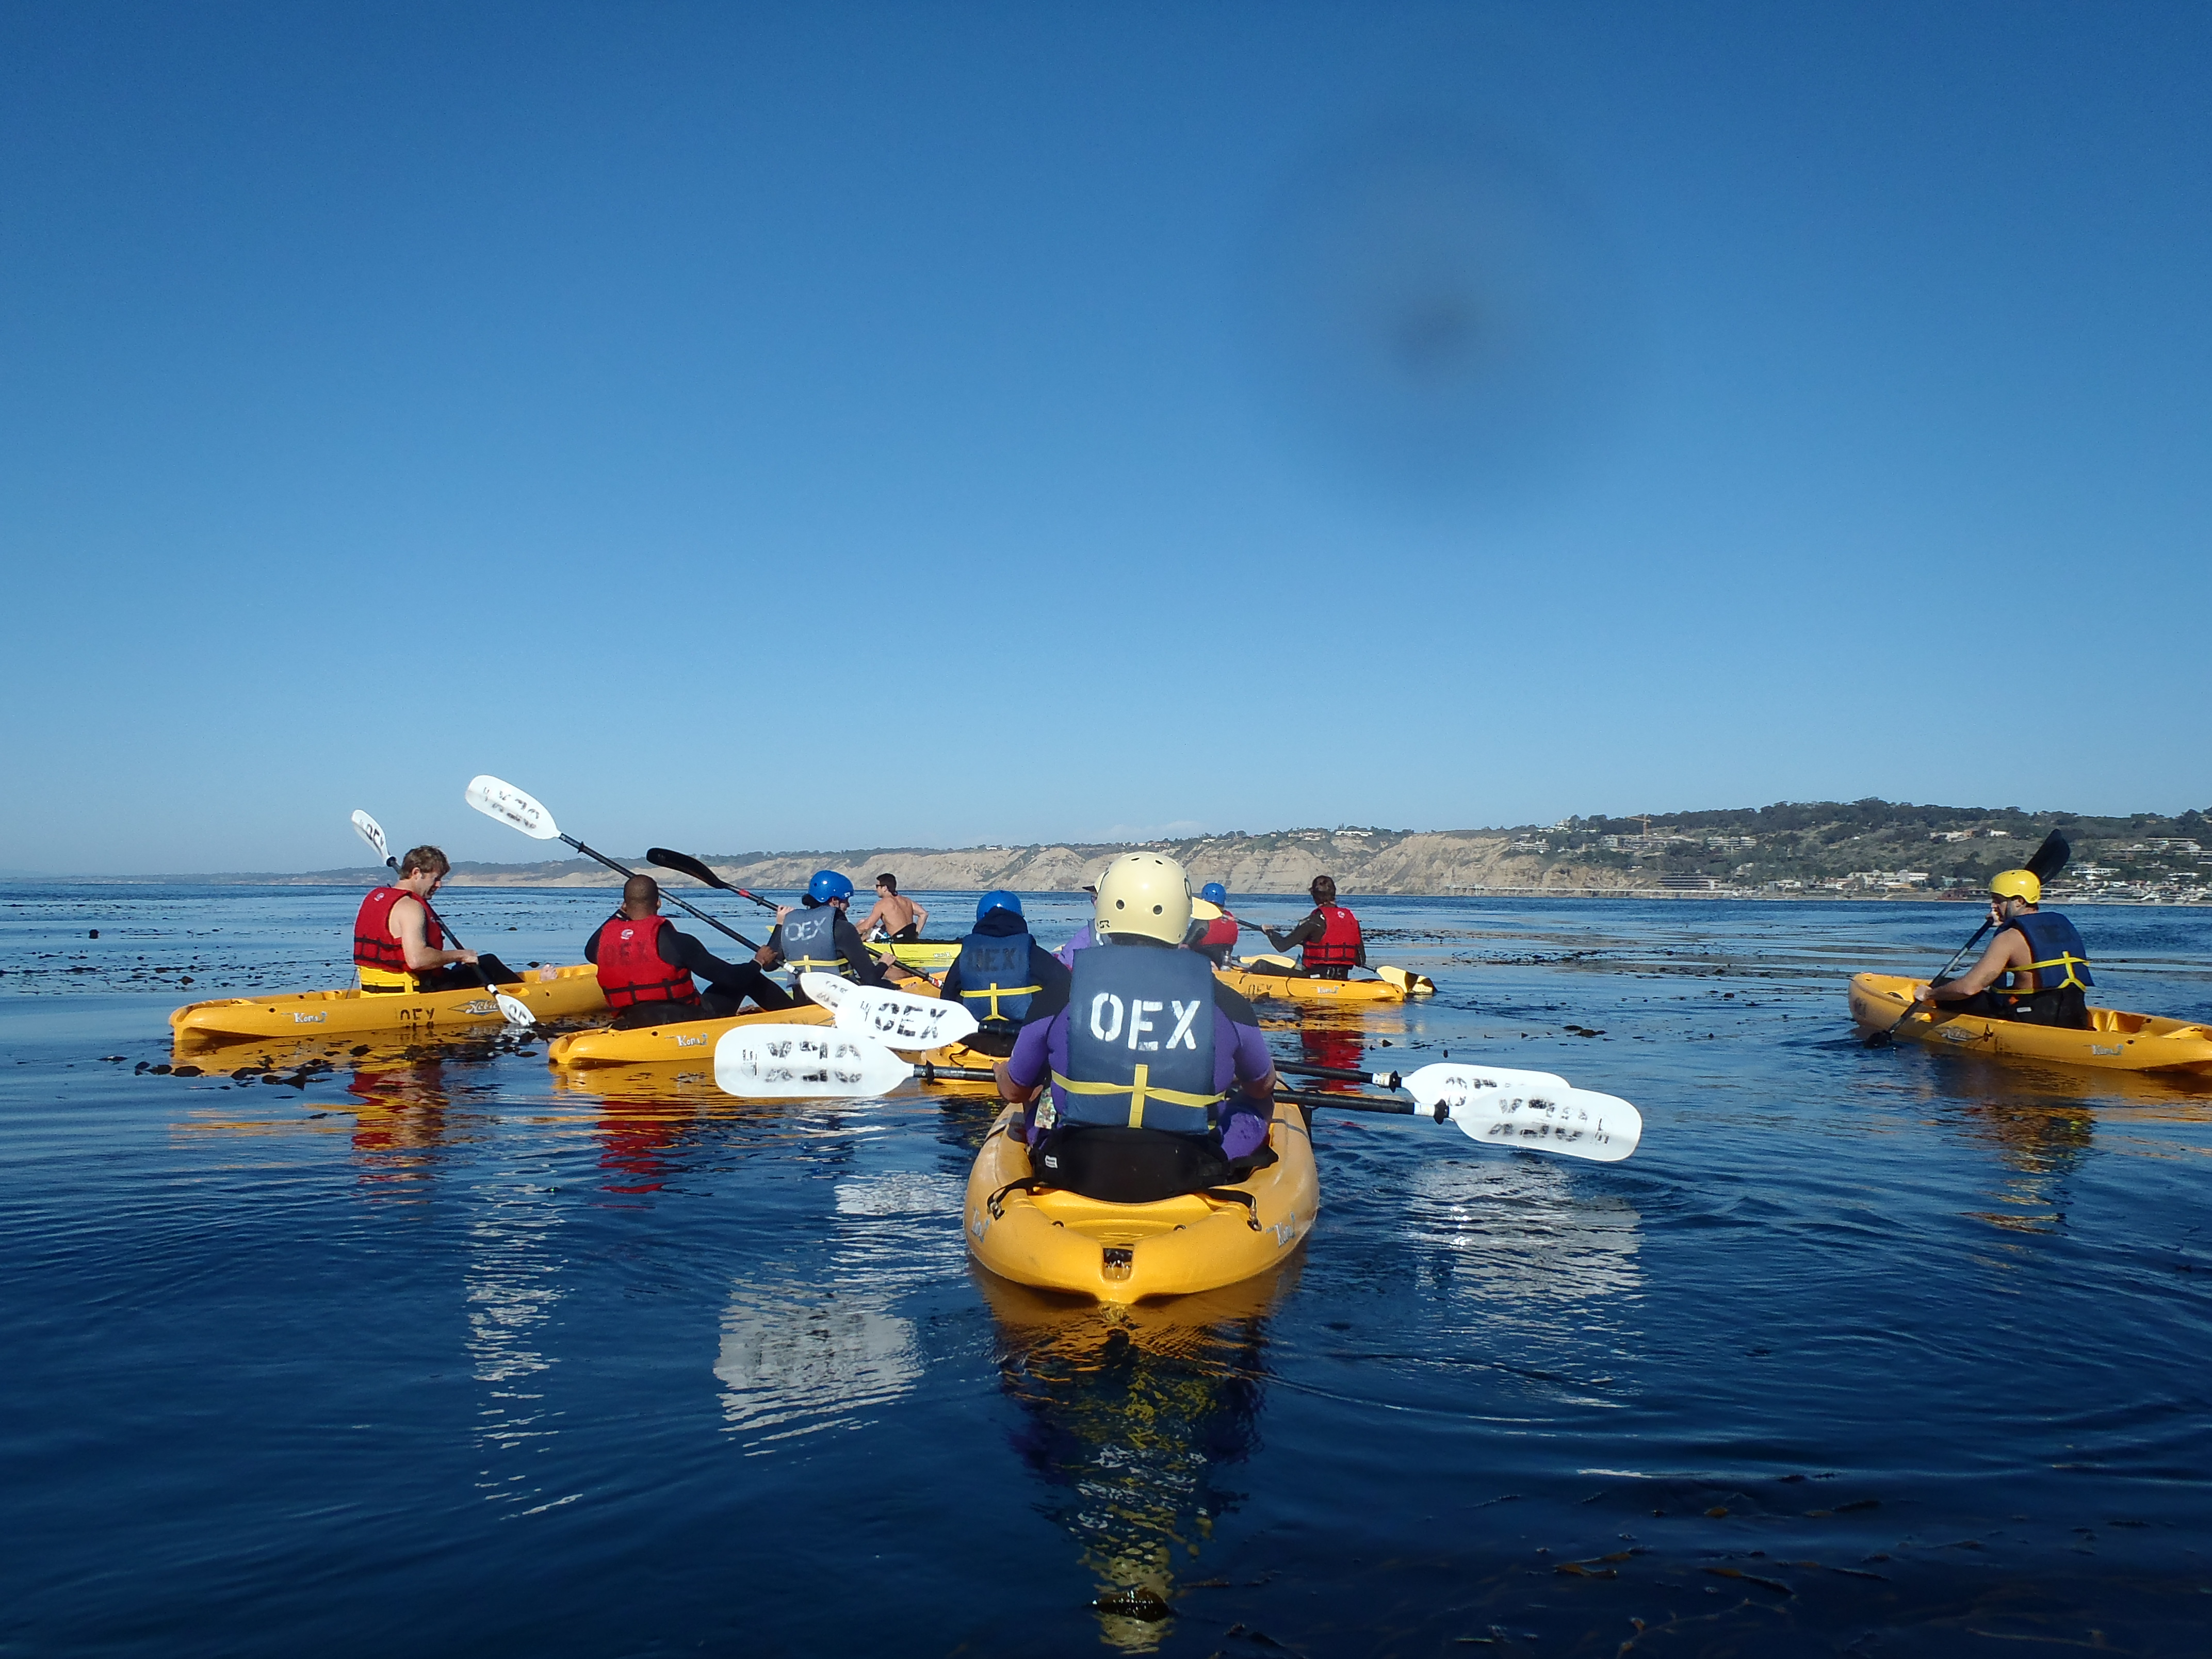 oex kayak tour in la jolla san diego travel blogoex kayak tour in la jolla